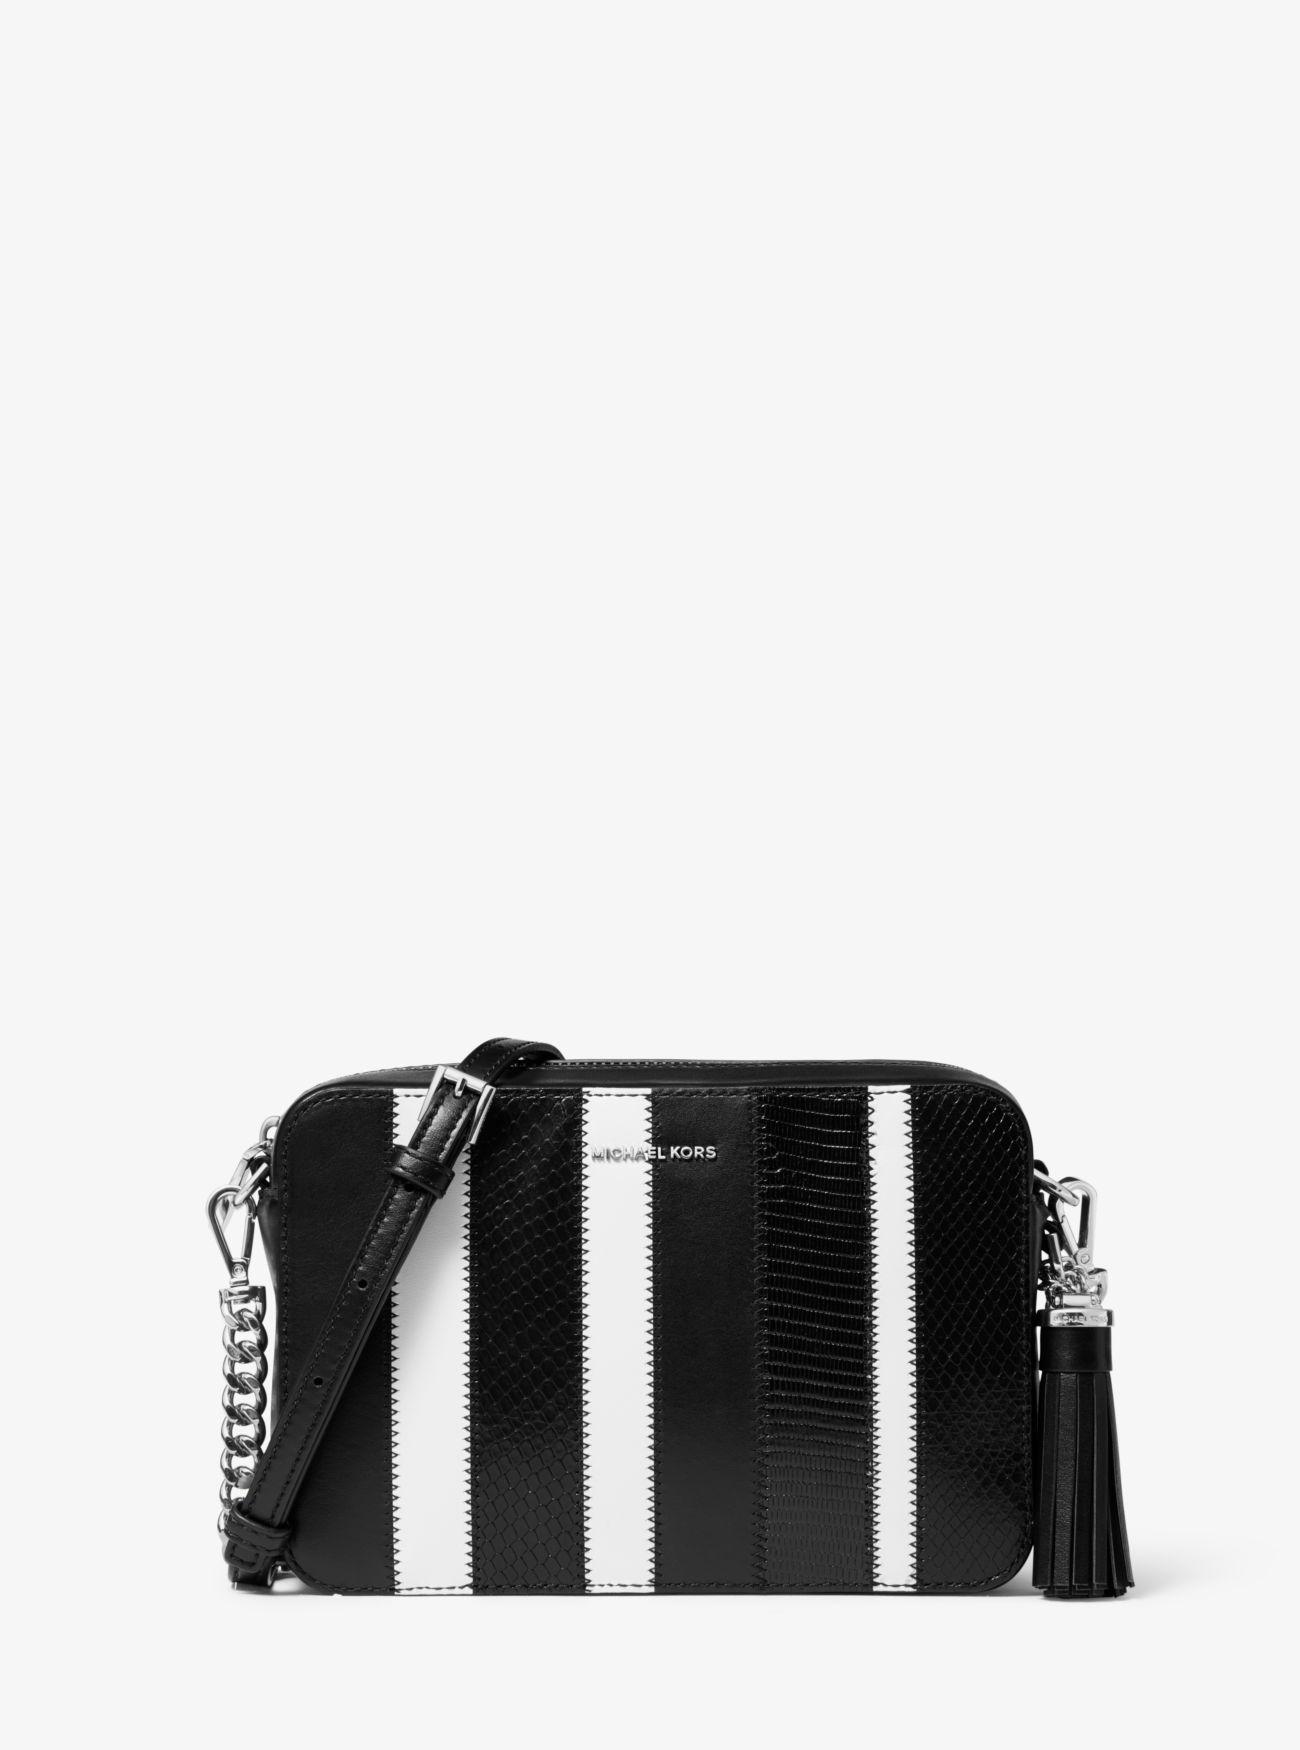 8b5006db26f2 MICHAEL Michael Kors. Women's Black Ginny Medium Striped Leather Crossbody  Bag